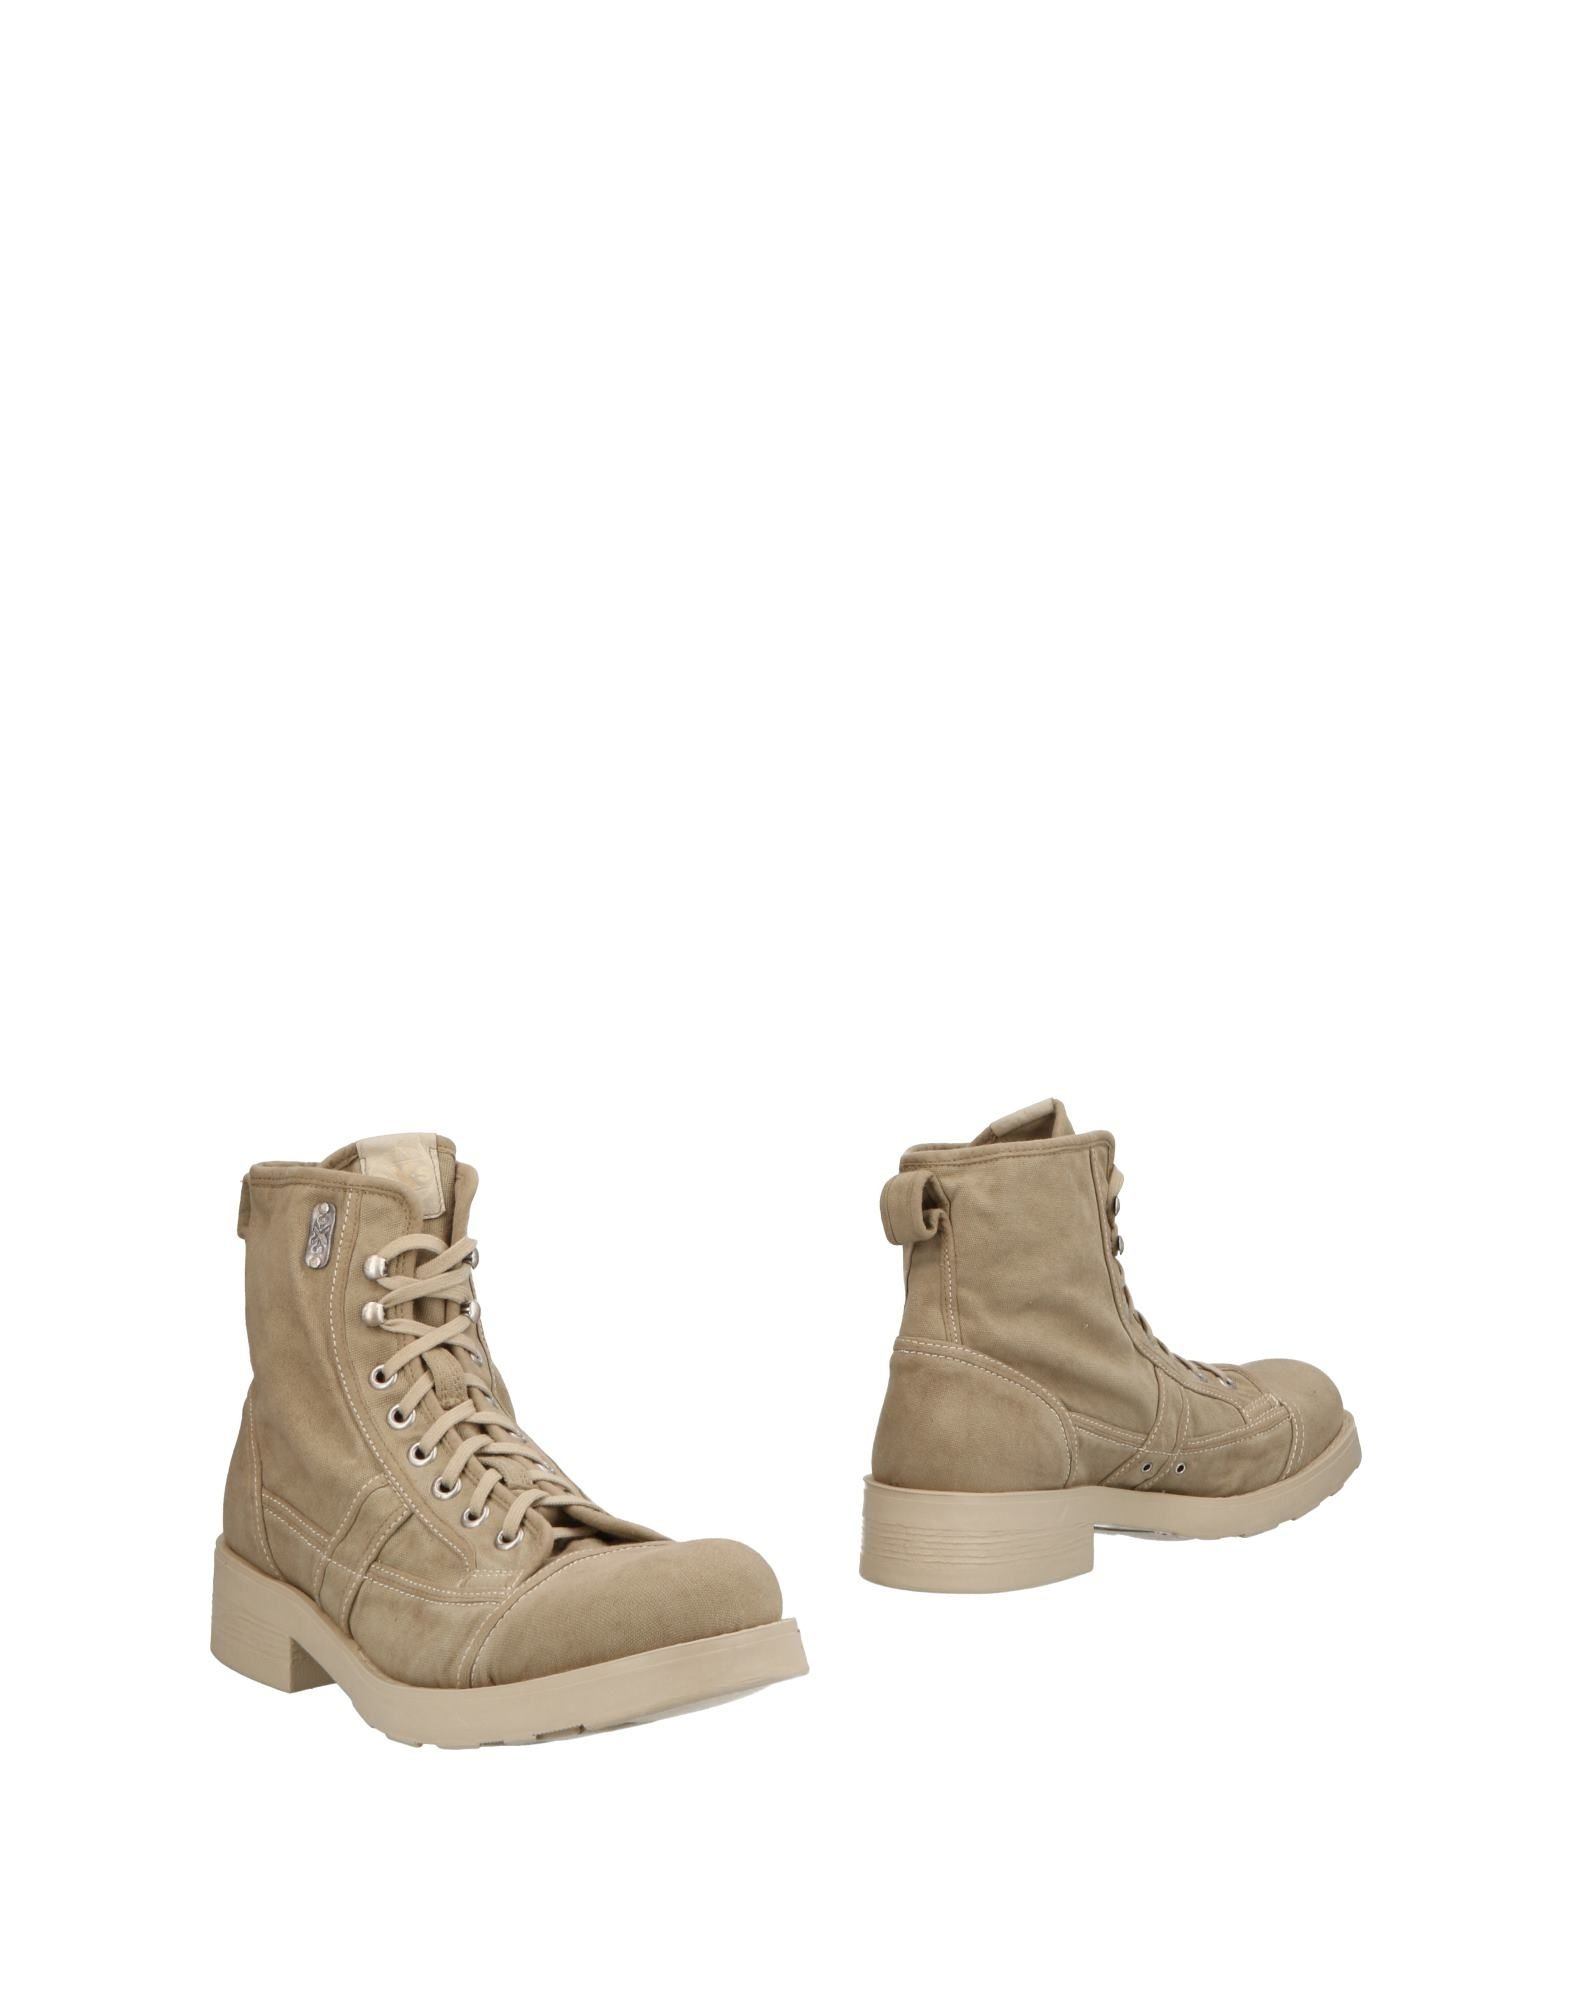 Rabatt echte Schuhe O.X.S. Stiefelette Herren  11118548CI